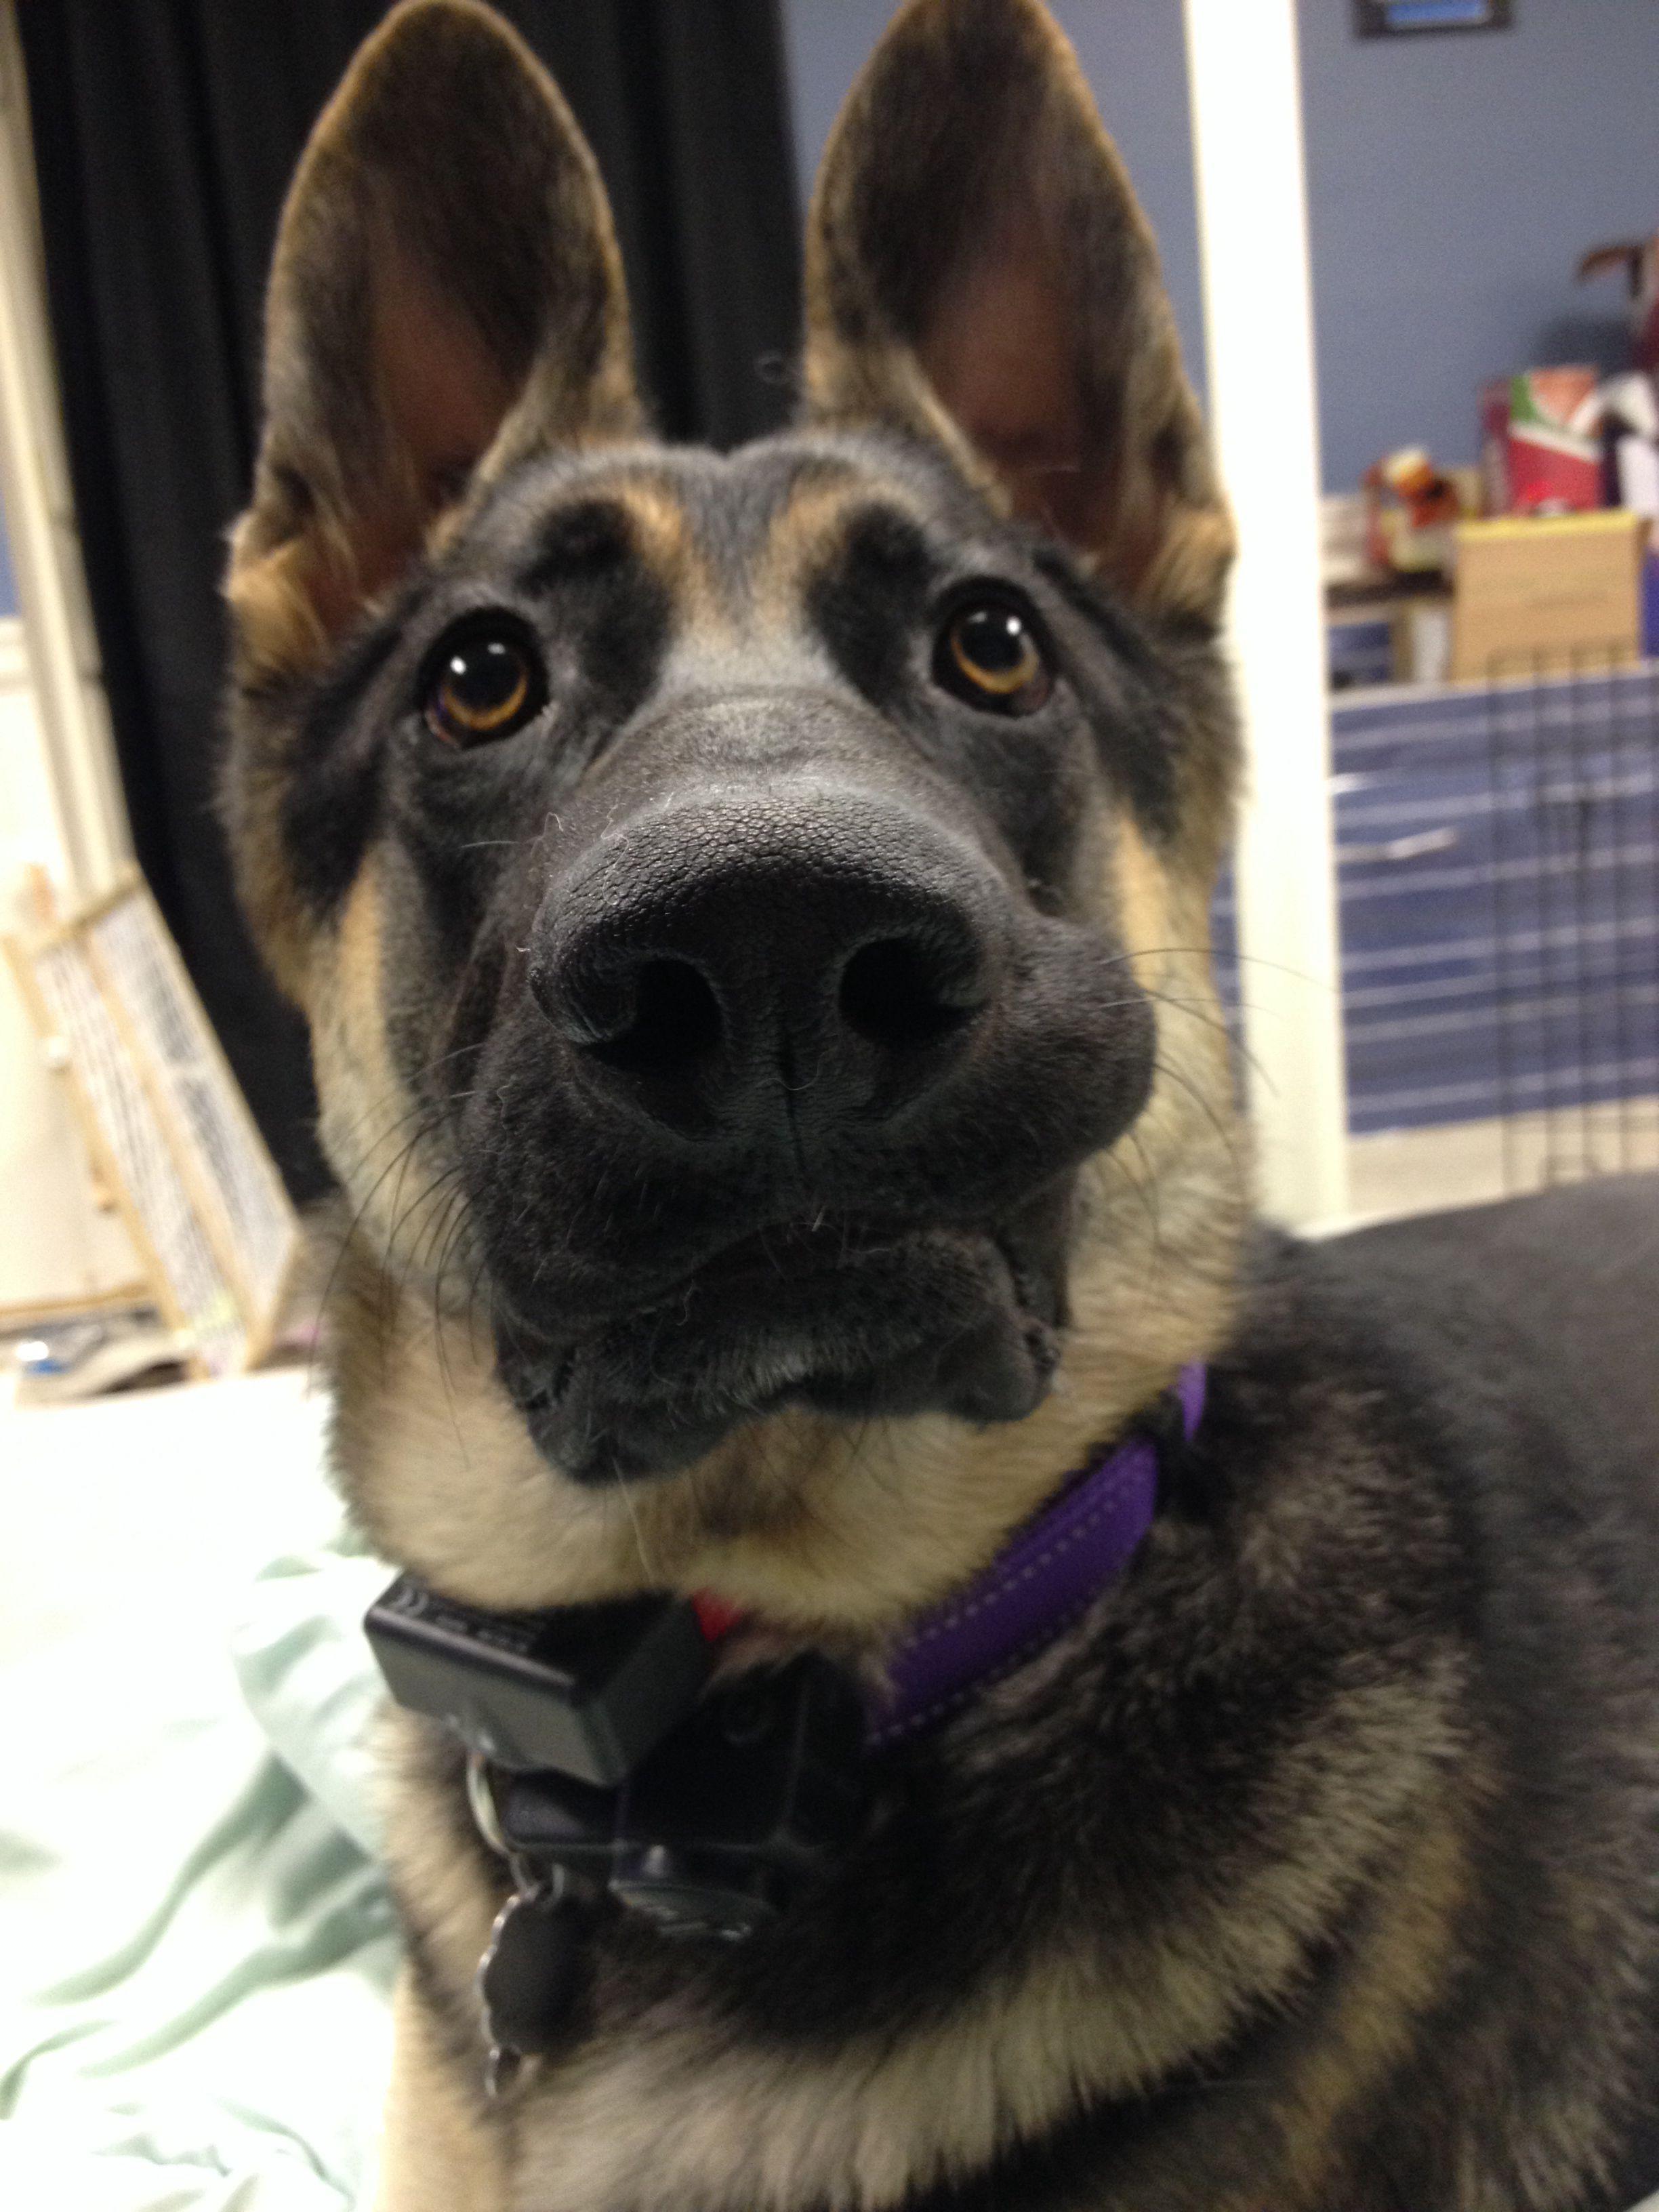 Mako 8 month German shepherd not impressed.